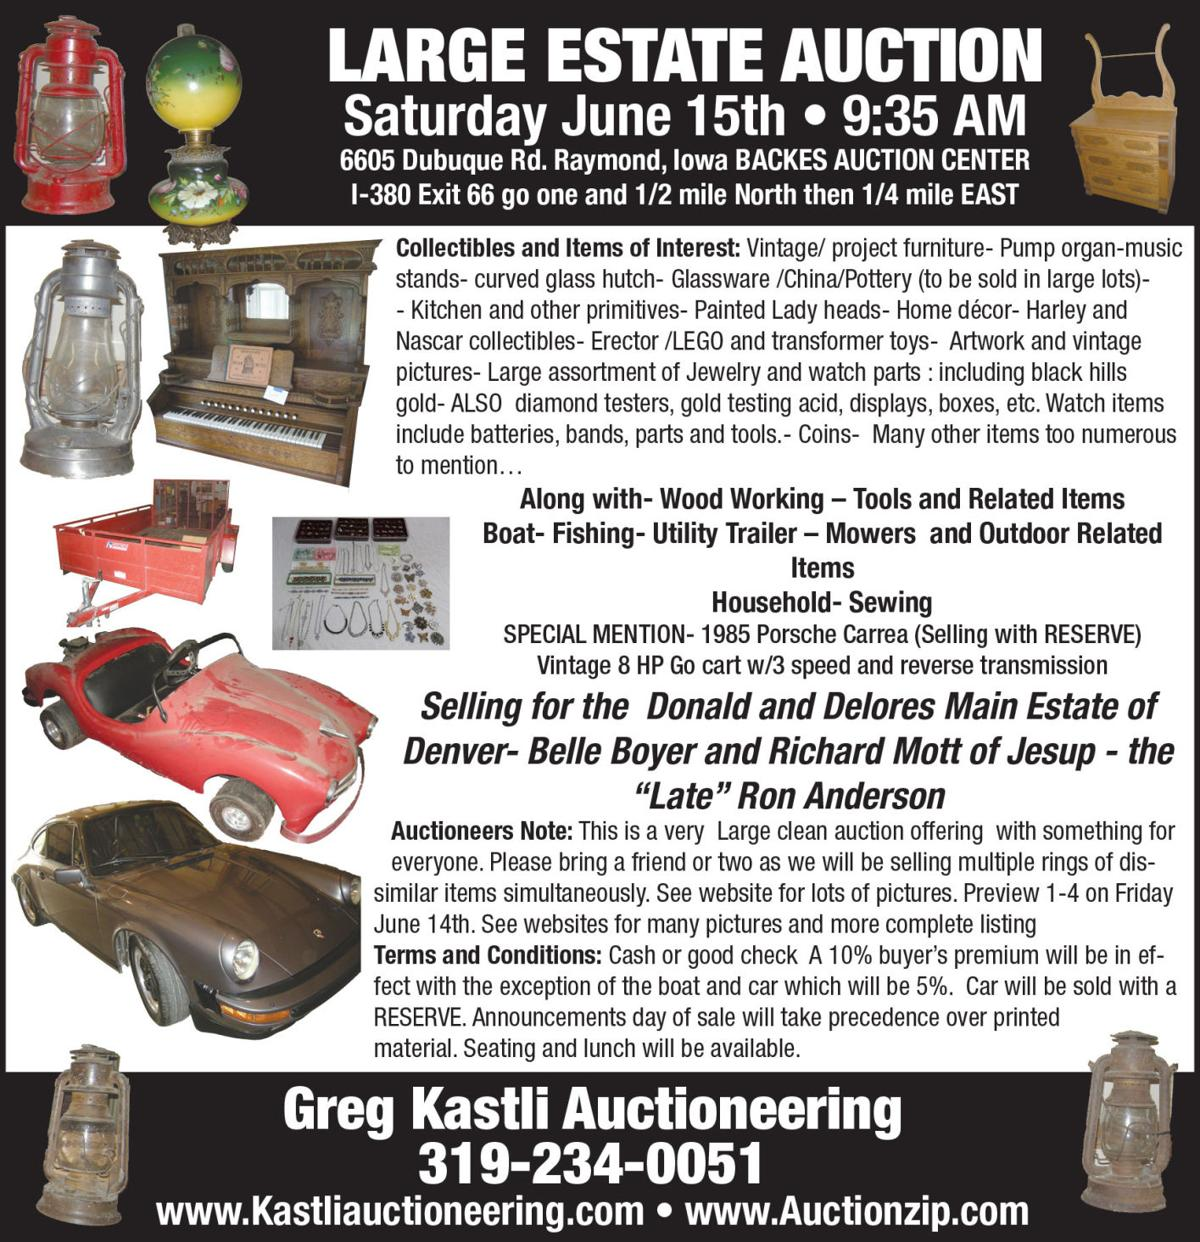 Large Estate Auction, Pump Organ, Curved Glass Hutch